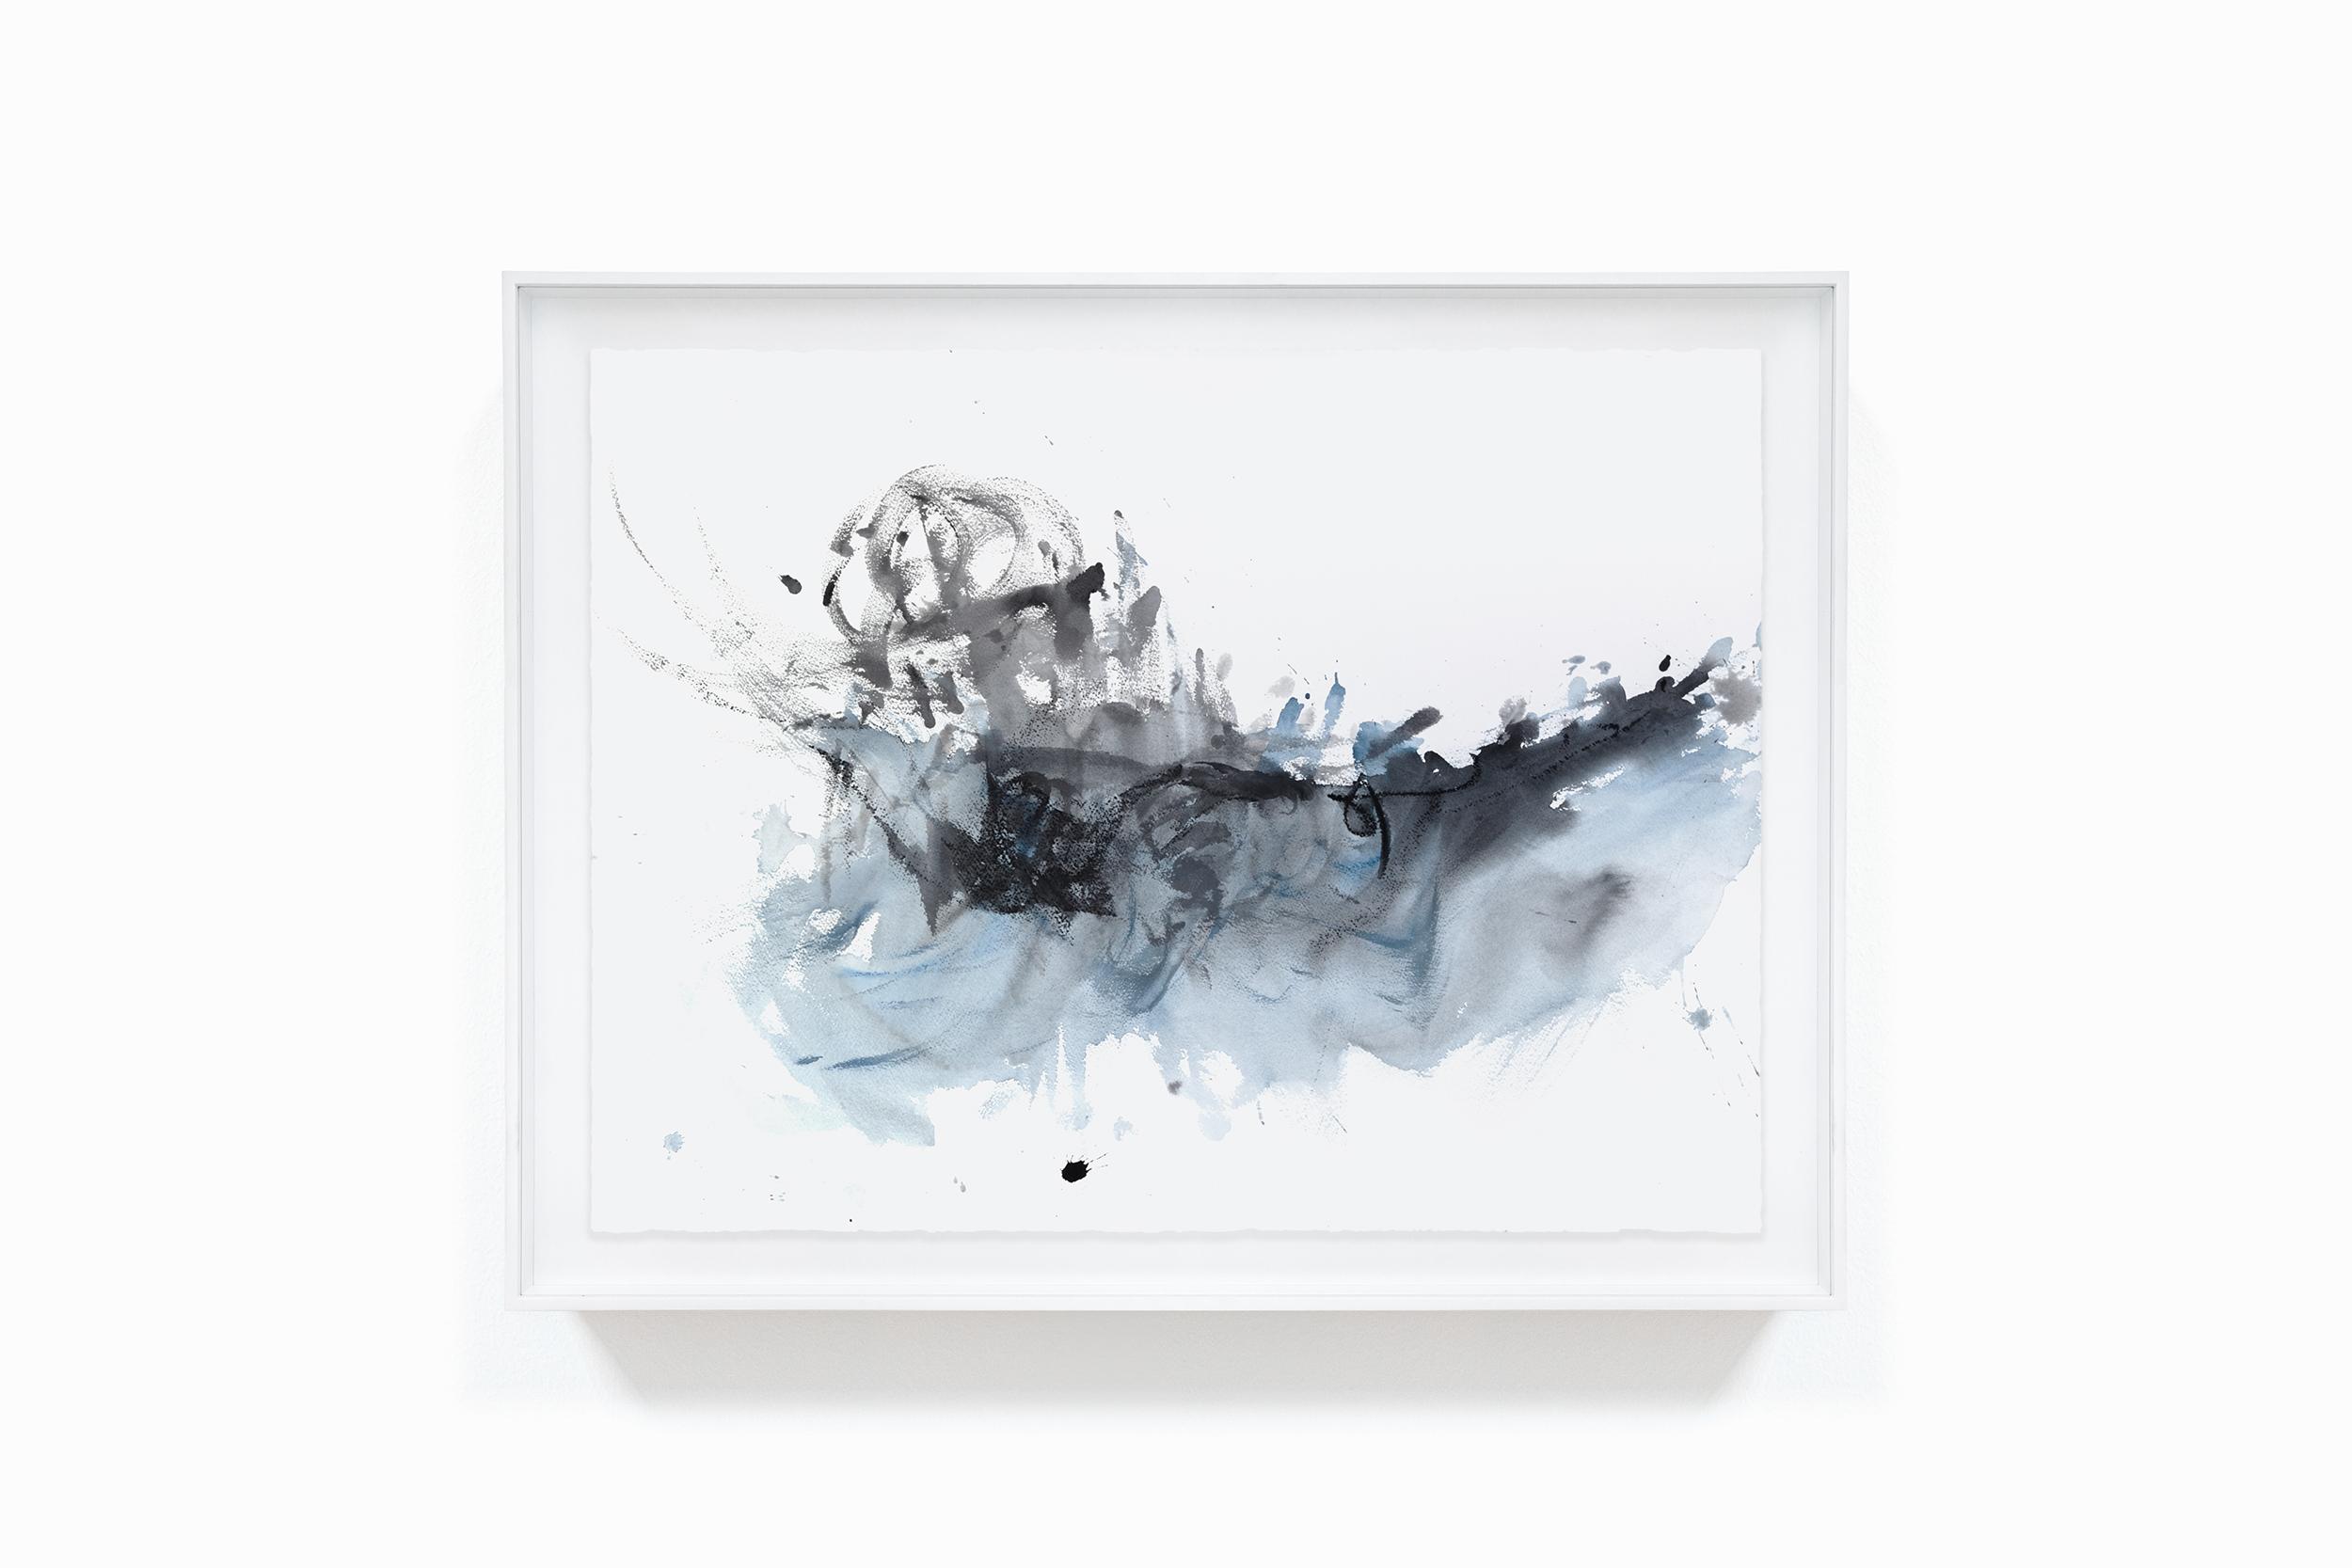 109N Andre Gigante Pintura Painting bonjourmolotov La.jpg